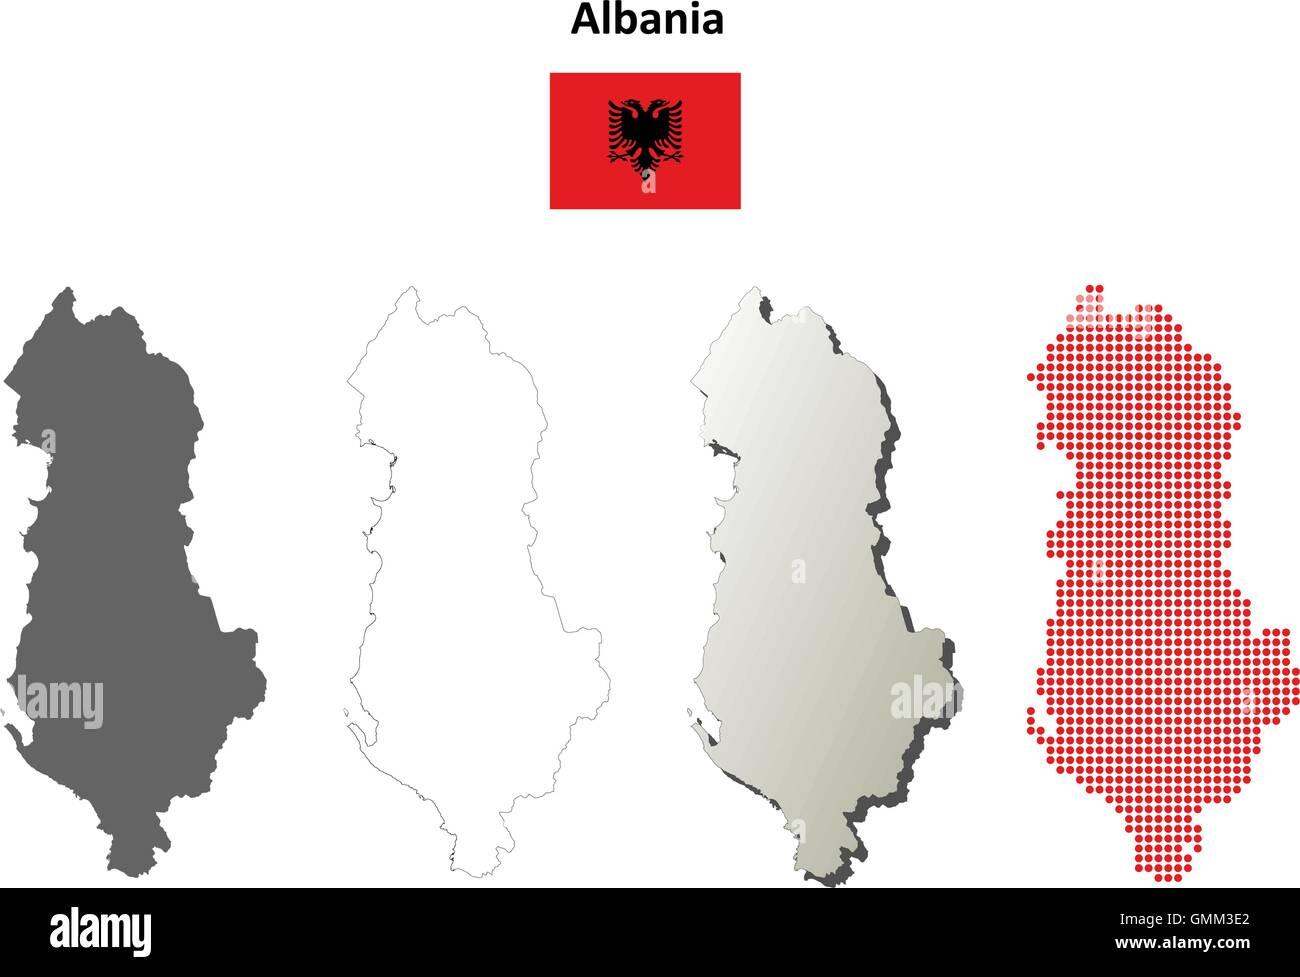 Albania outline map set - Stock Vector